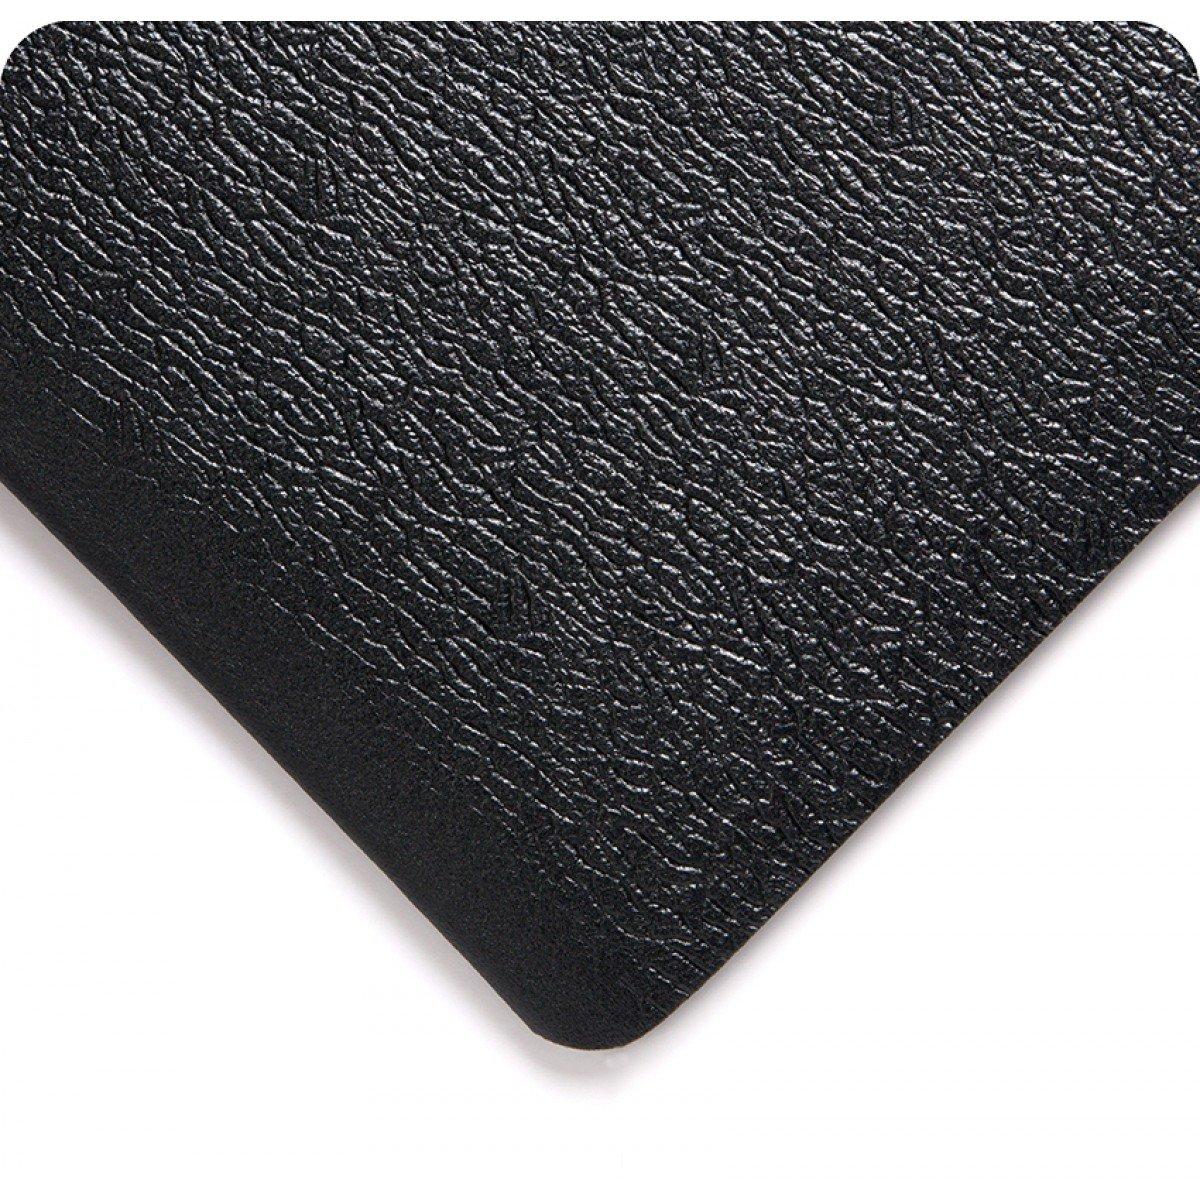 Black 31 Length x 3 Width x 3//8 Thick Wearwell 427.38x3x31BK Soft Step Mat